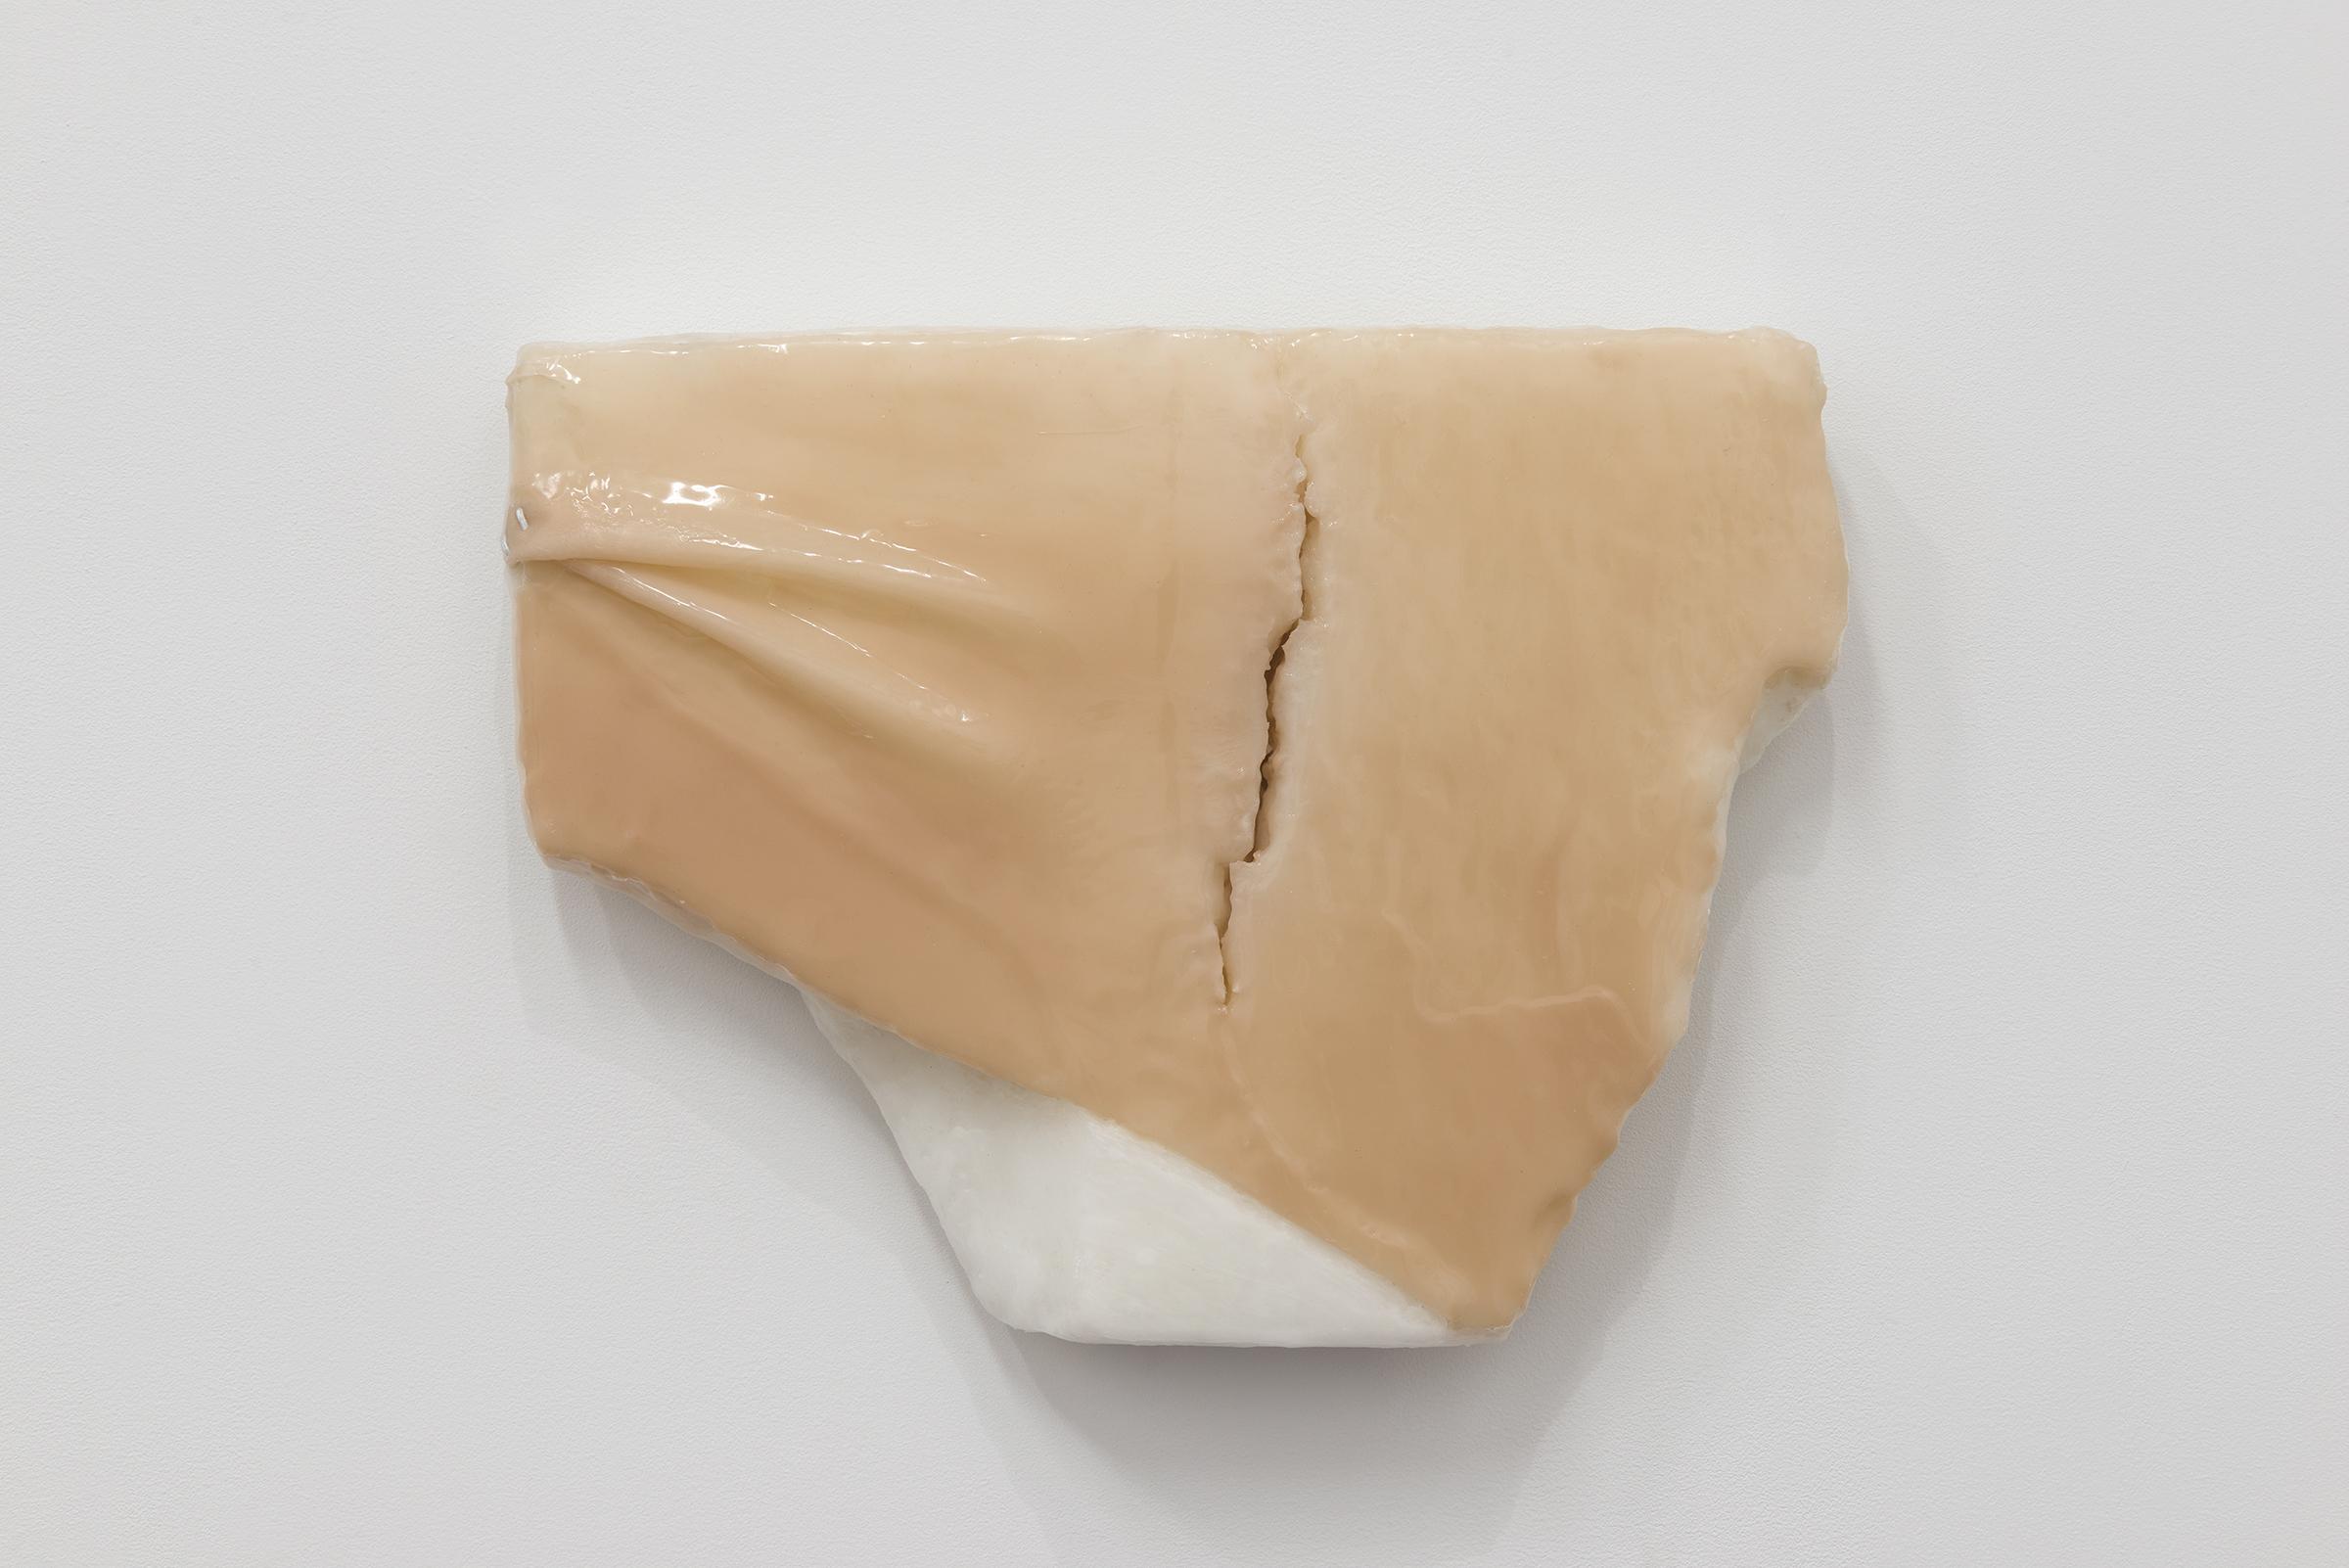 Ivana Basic, Ungrounding 2,  2014,wax, silicon, linoleum,16 x 12.5 x 2.5 in